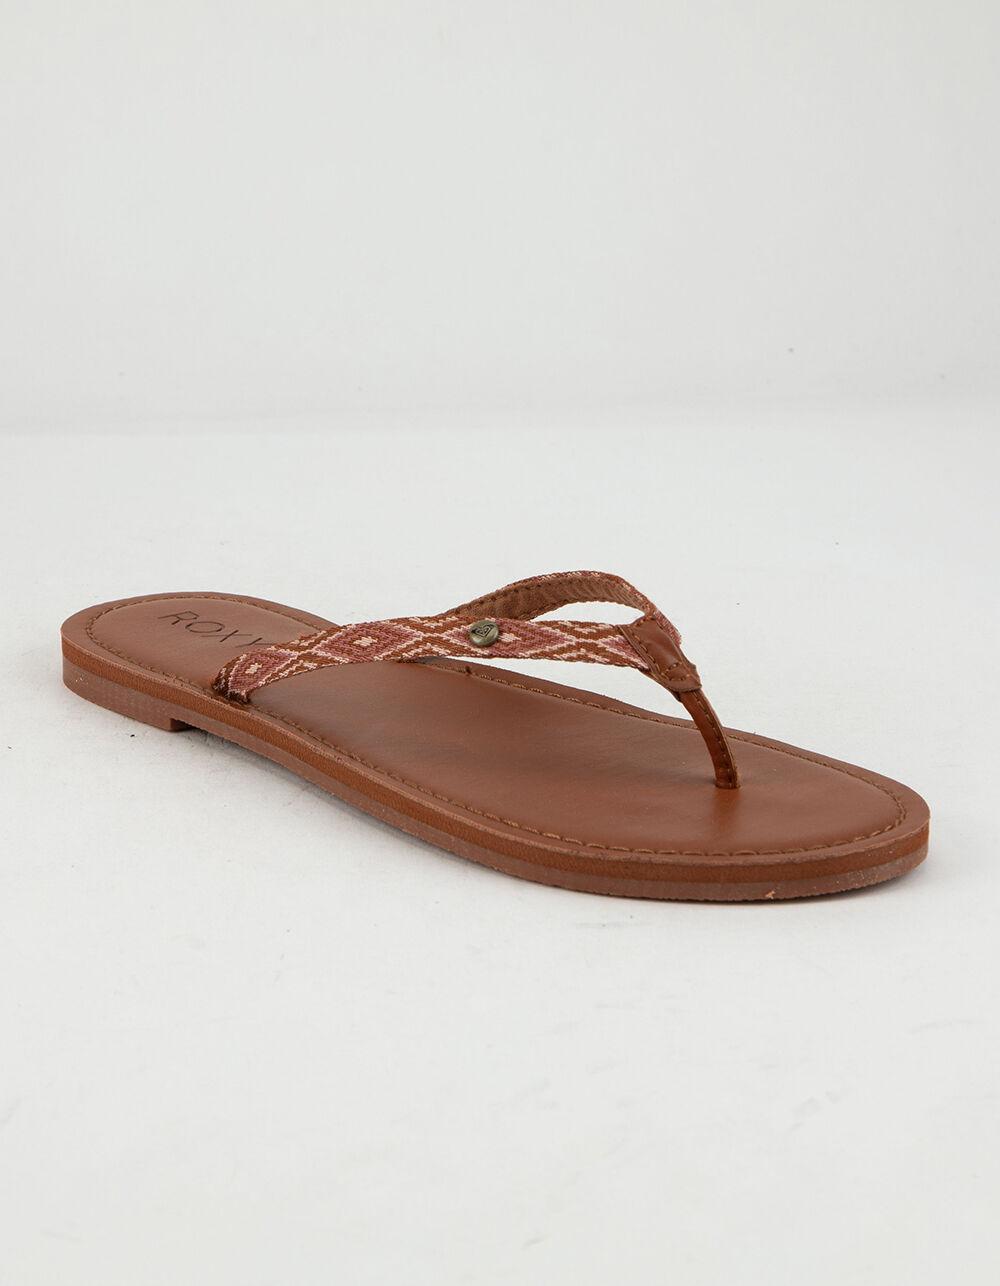 ROXY Janel Tan Sandals